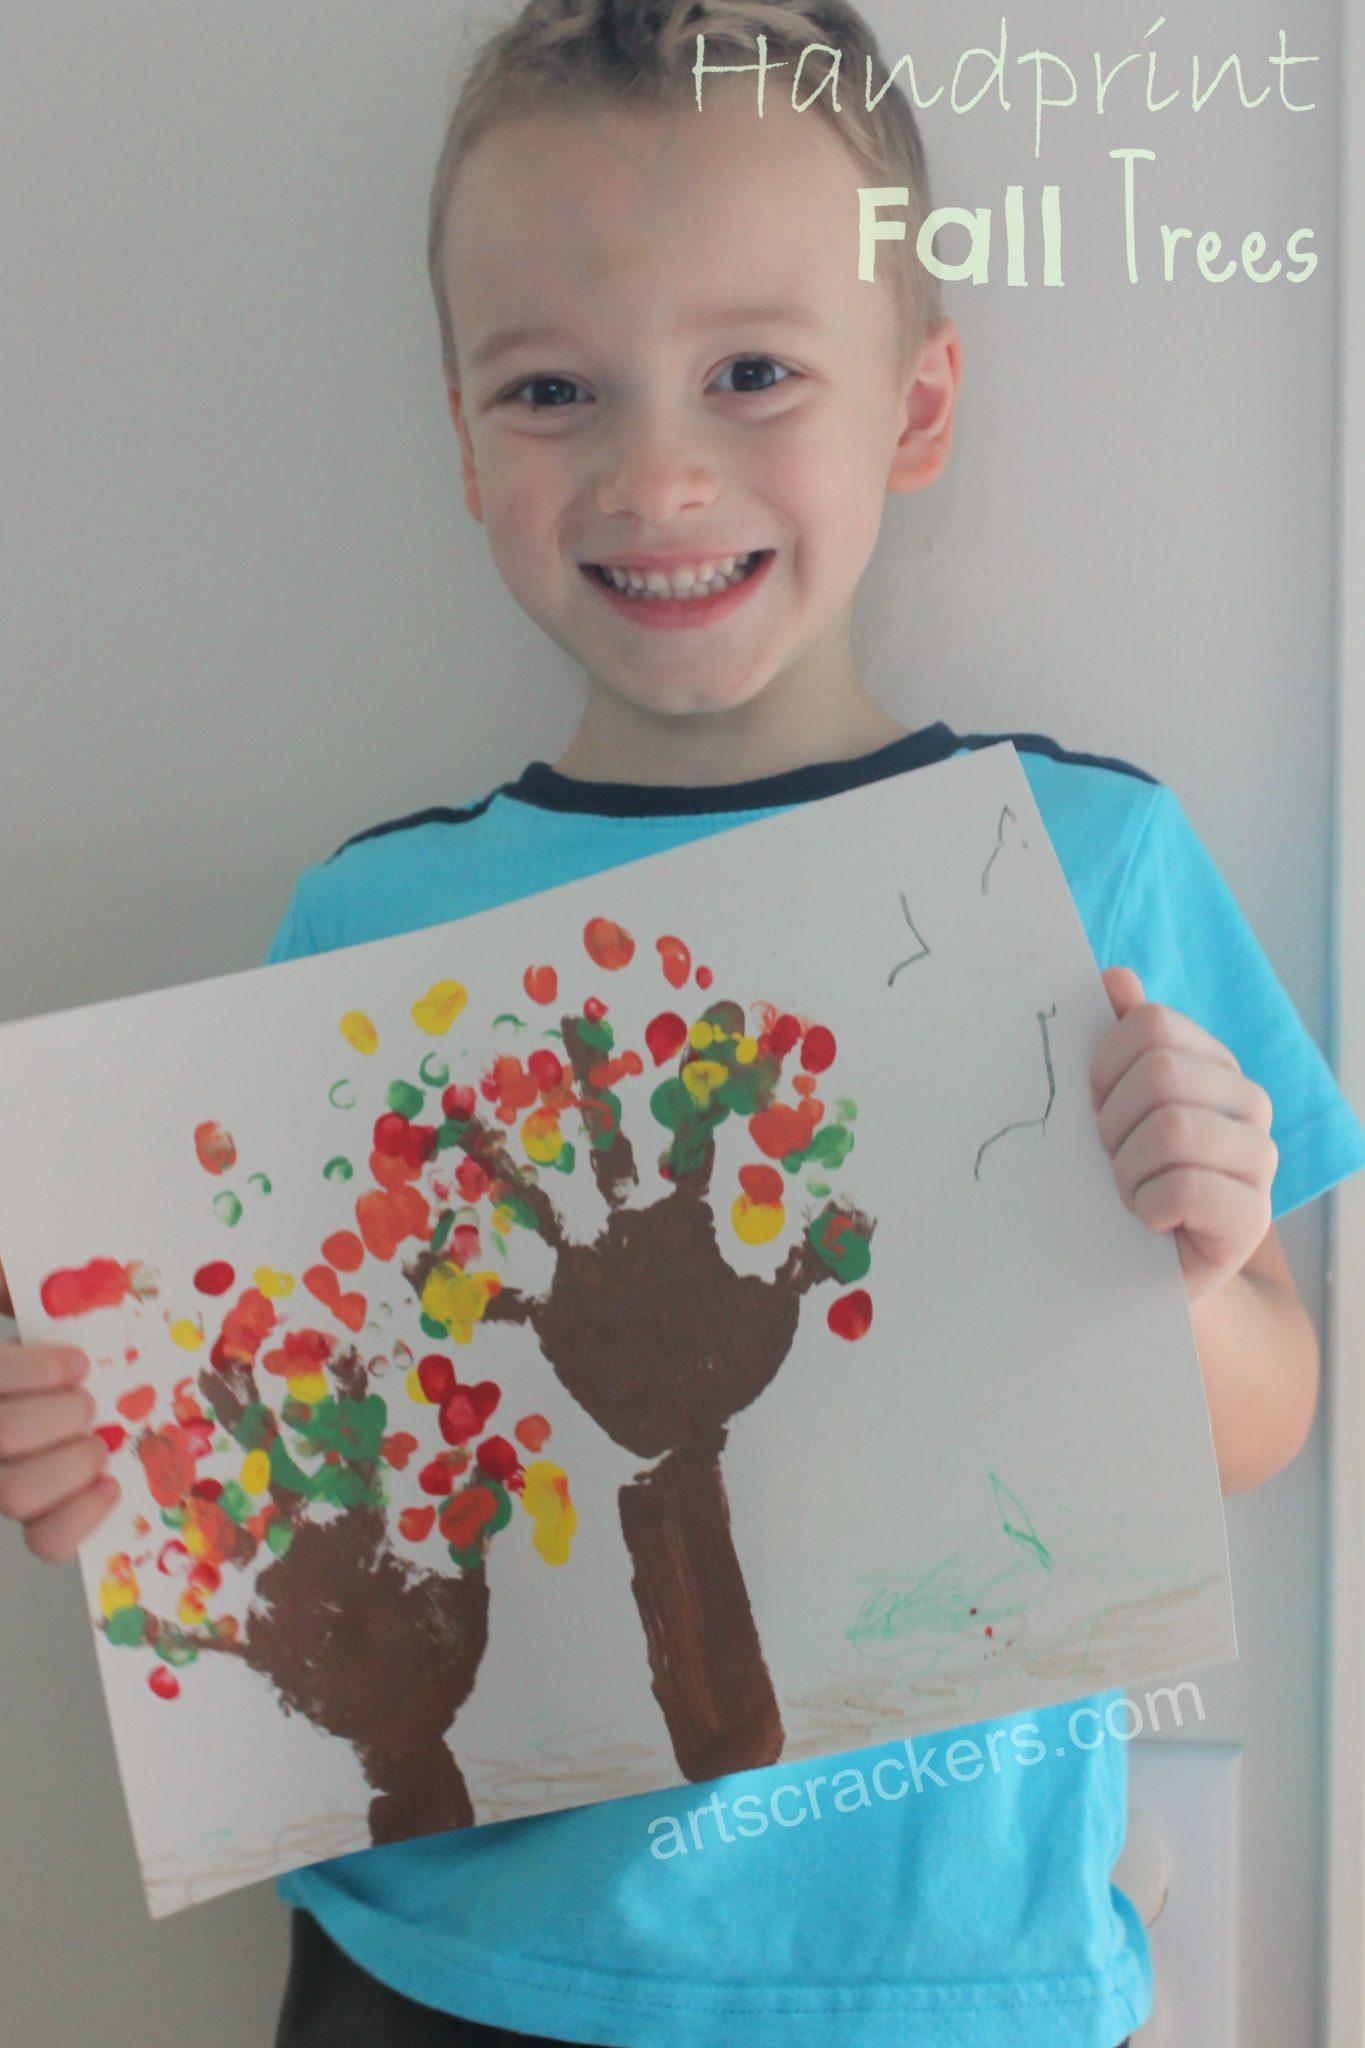 Handprint Fall Trees Craft